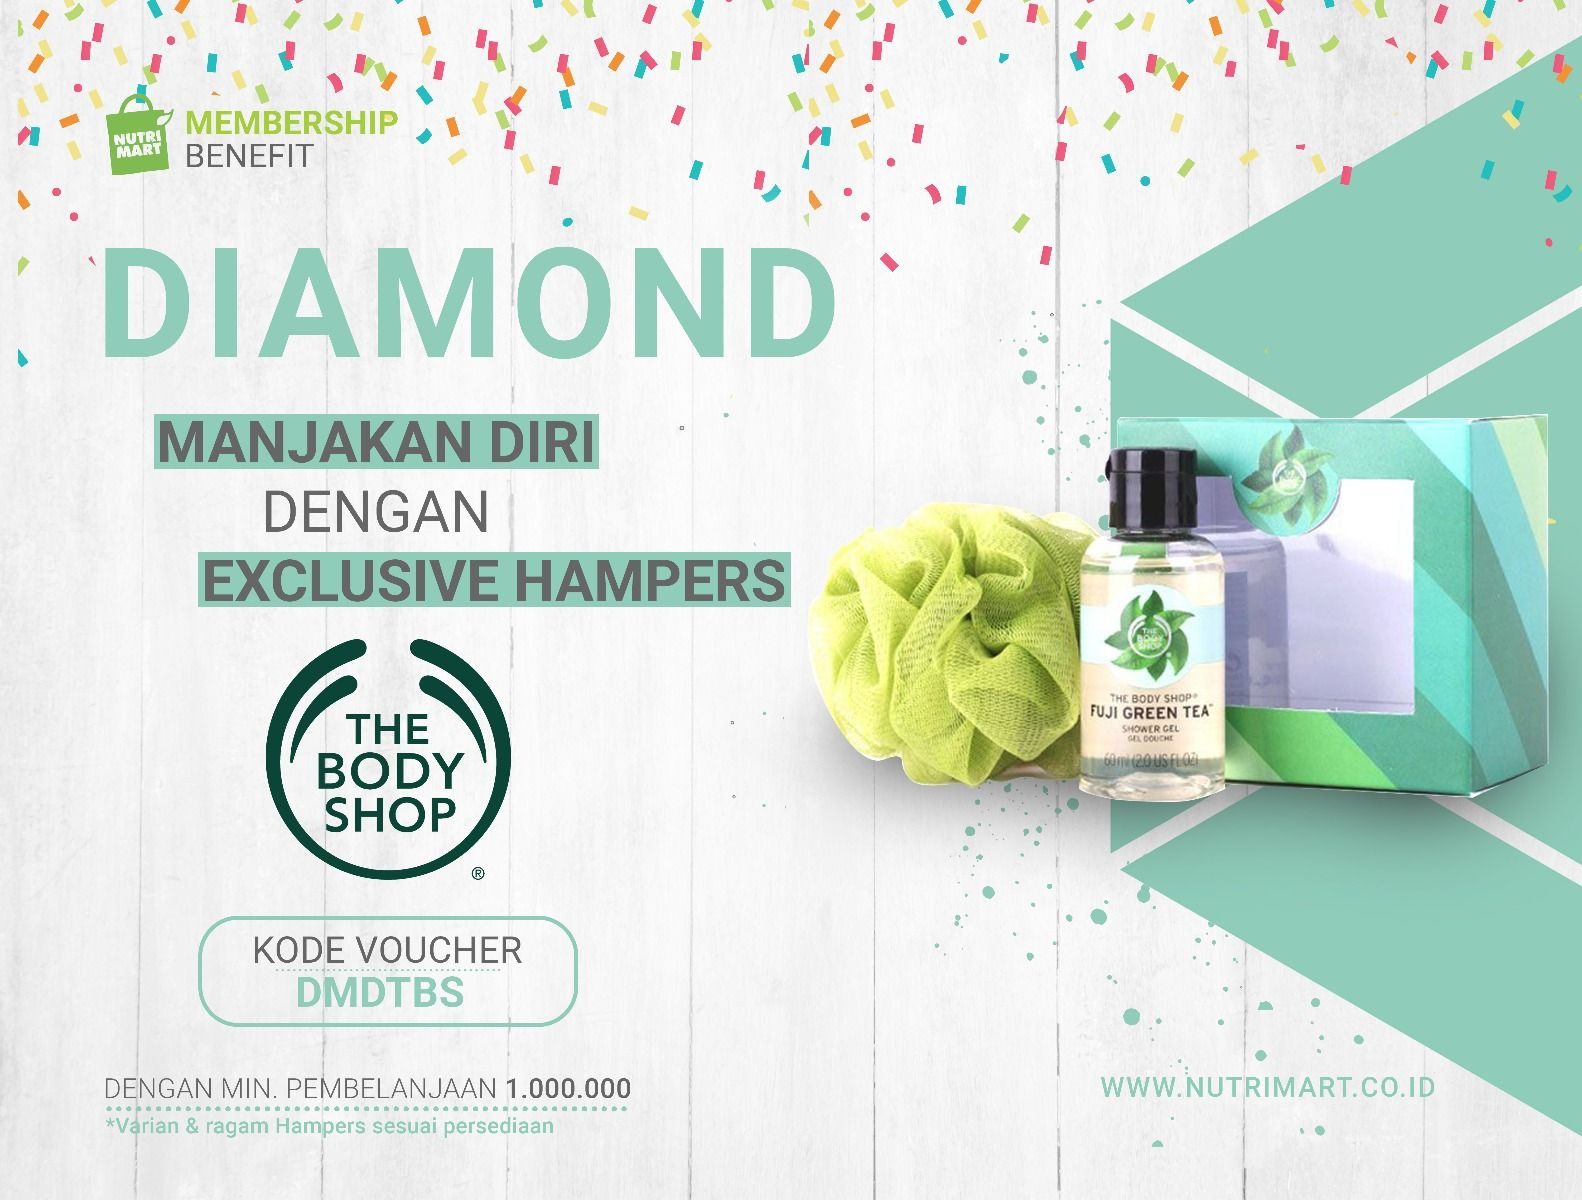 Diamond The Body Shop